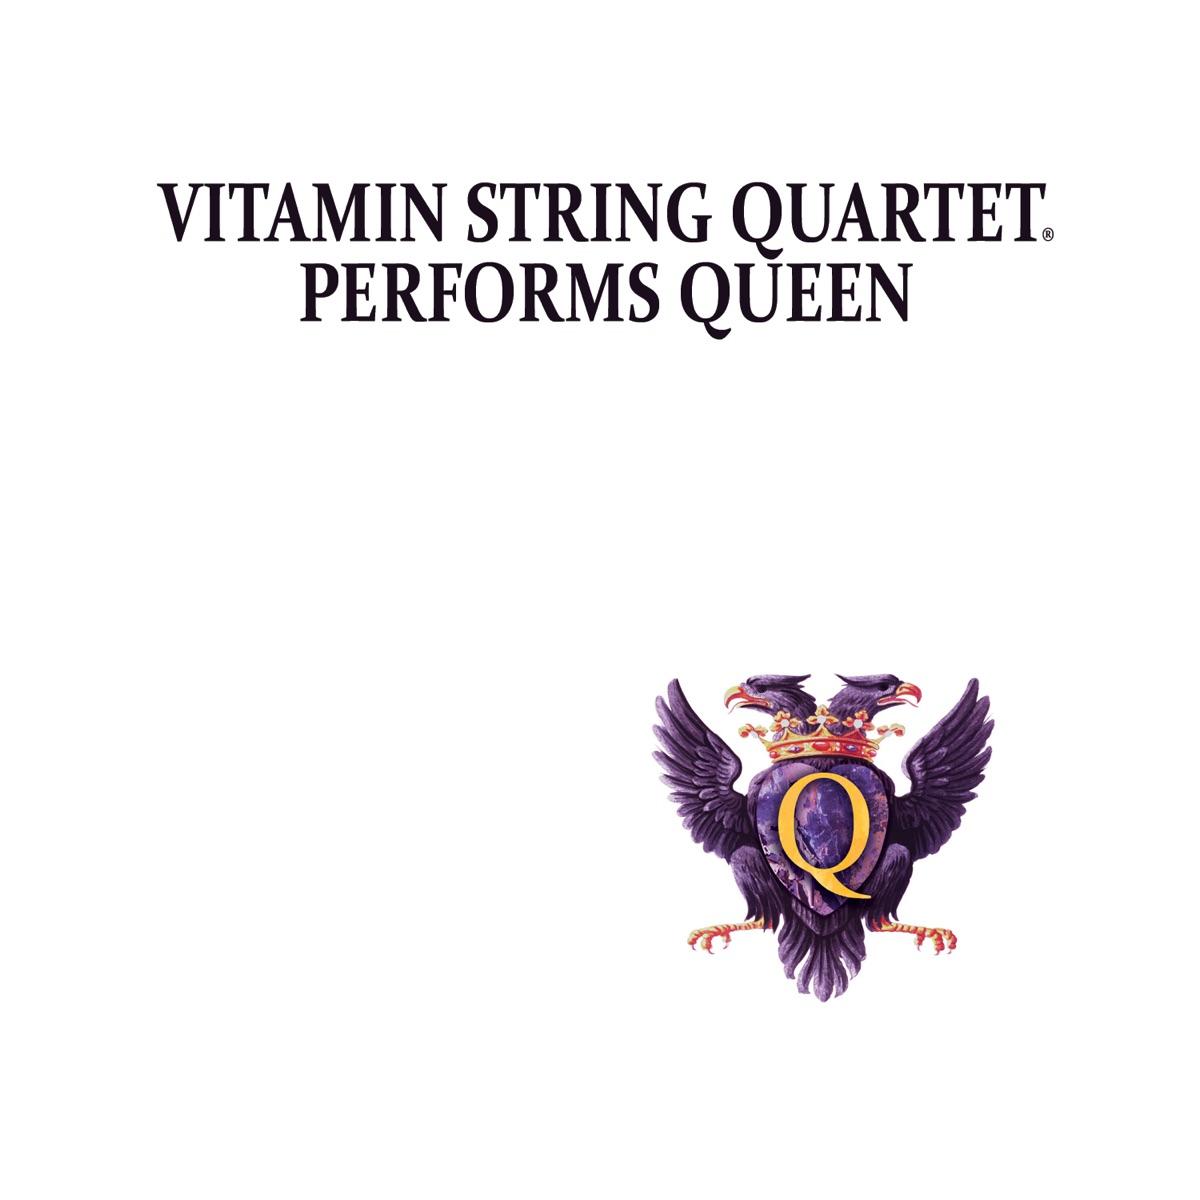 Vitamin String Quartet Performs Queen Vitamin String Quartet CD cover